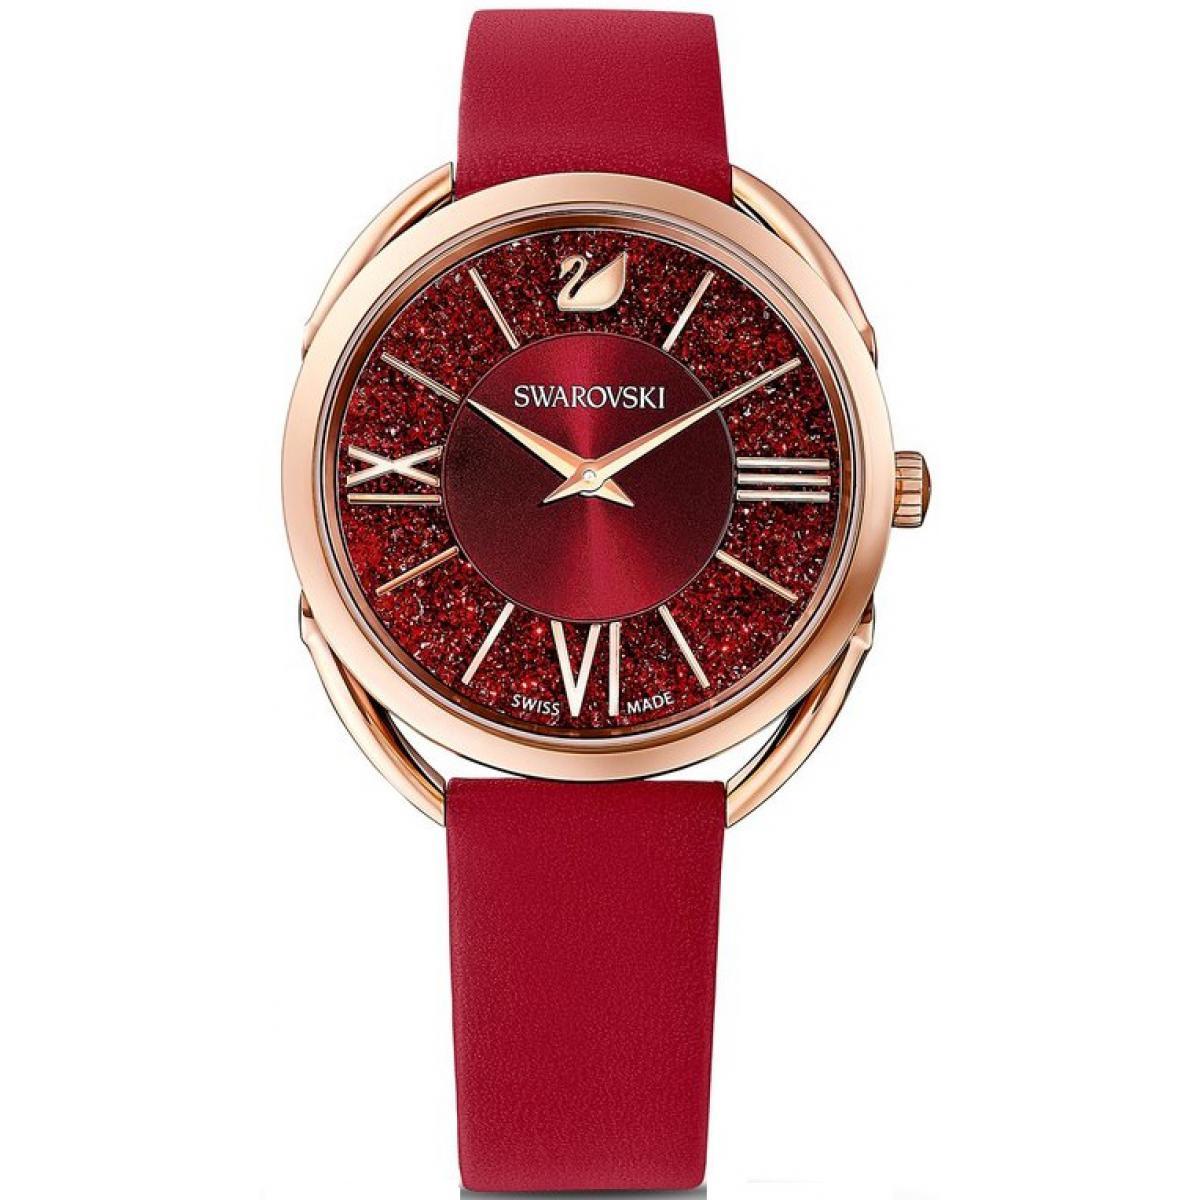 Montre Swarovski 5519219 Femme - Swarovski montres - Modalova